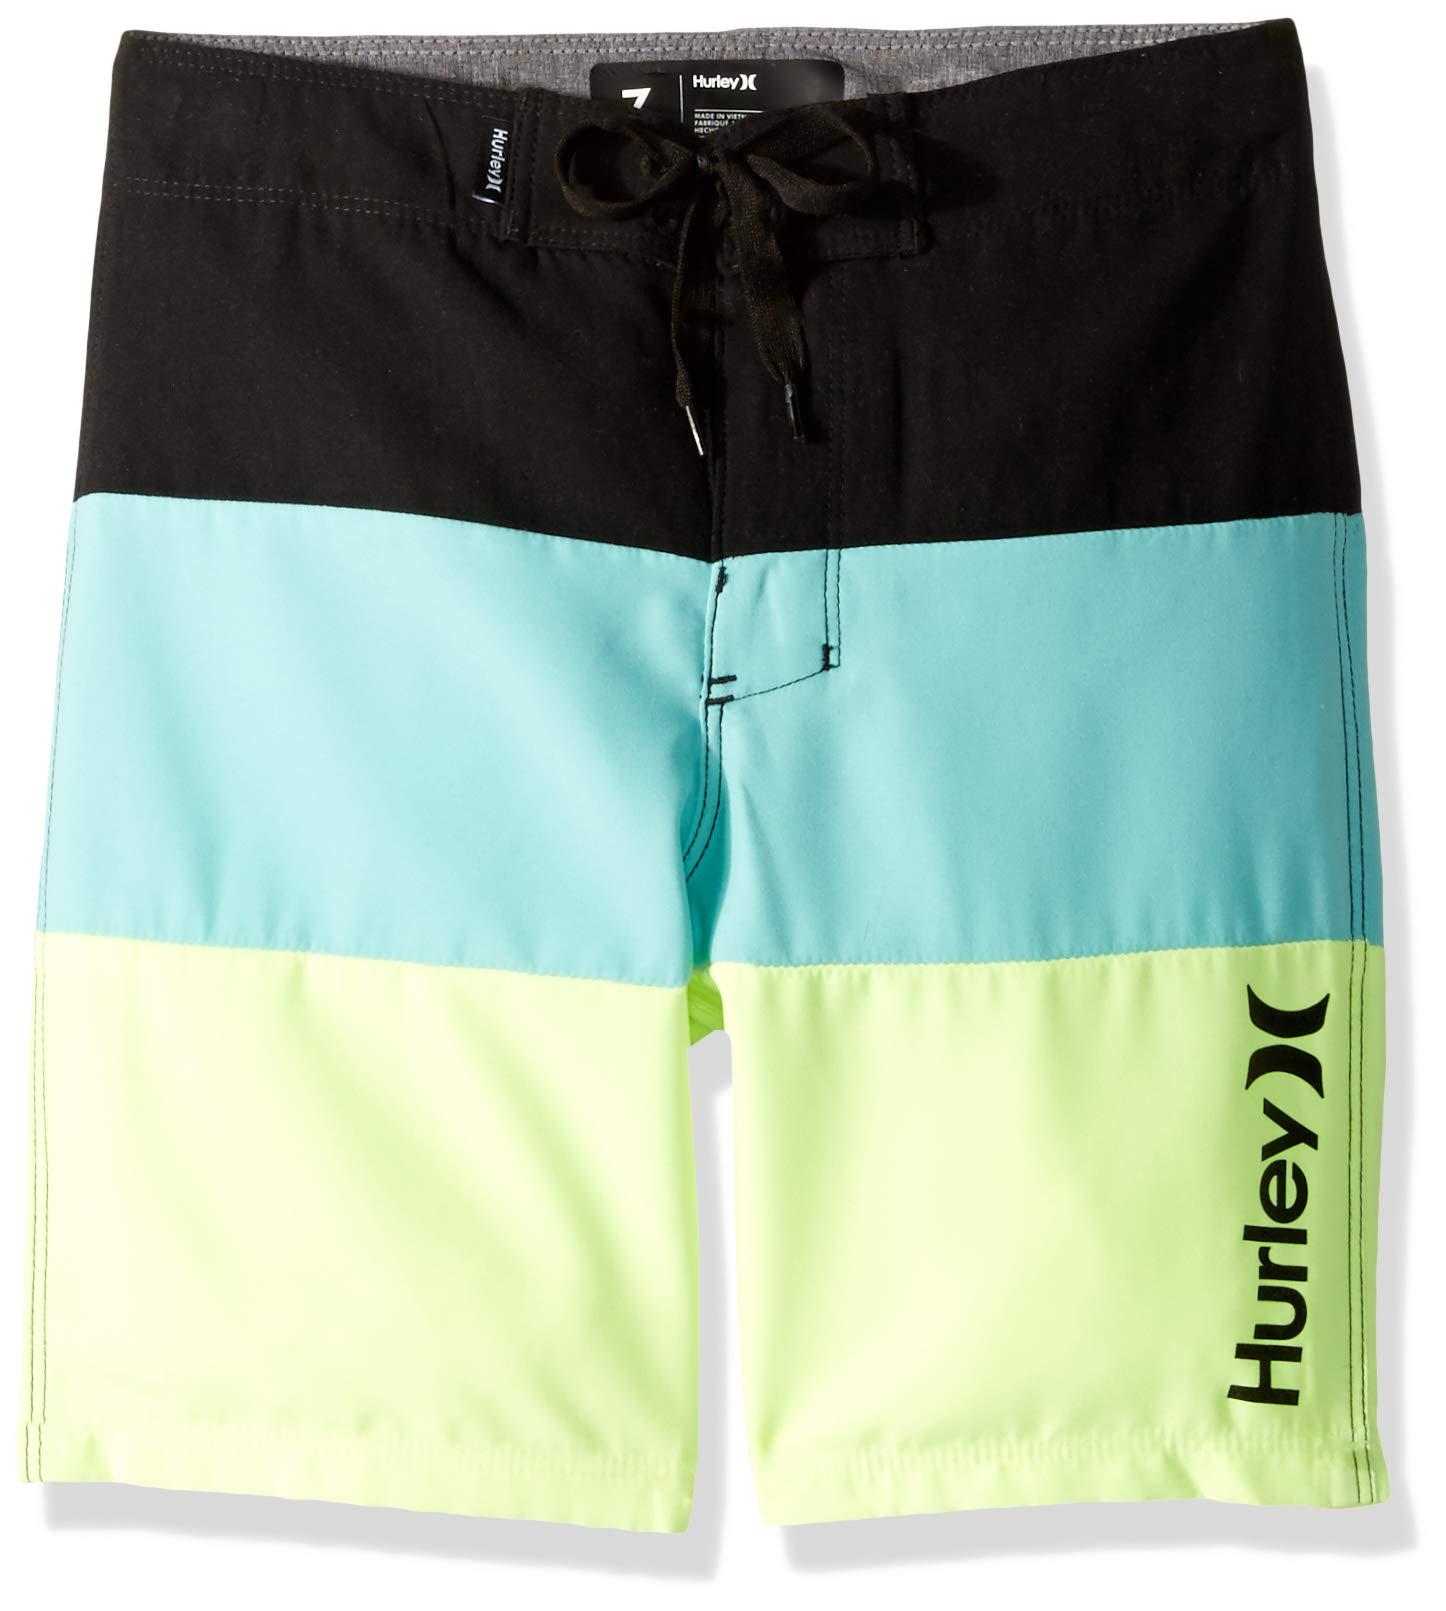 Hurley Boys' Little Board Shorts, Tropical Twist/Black, 7